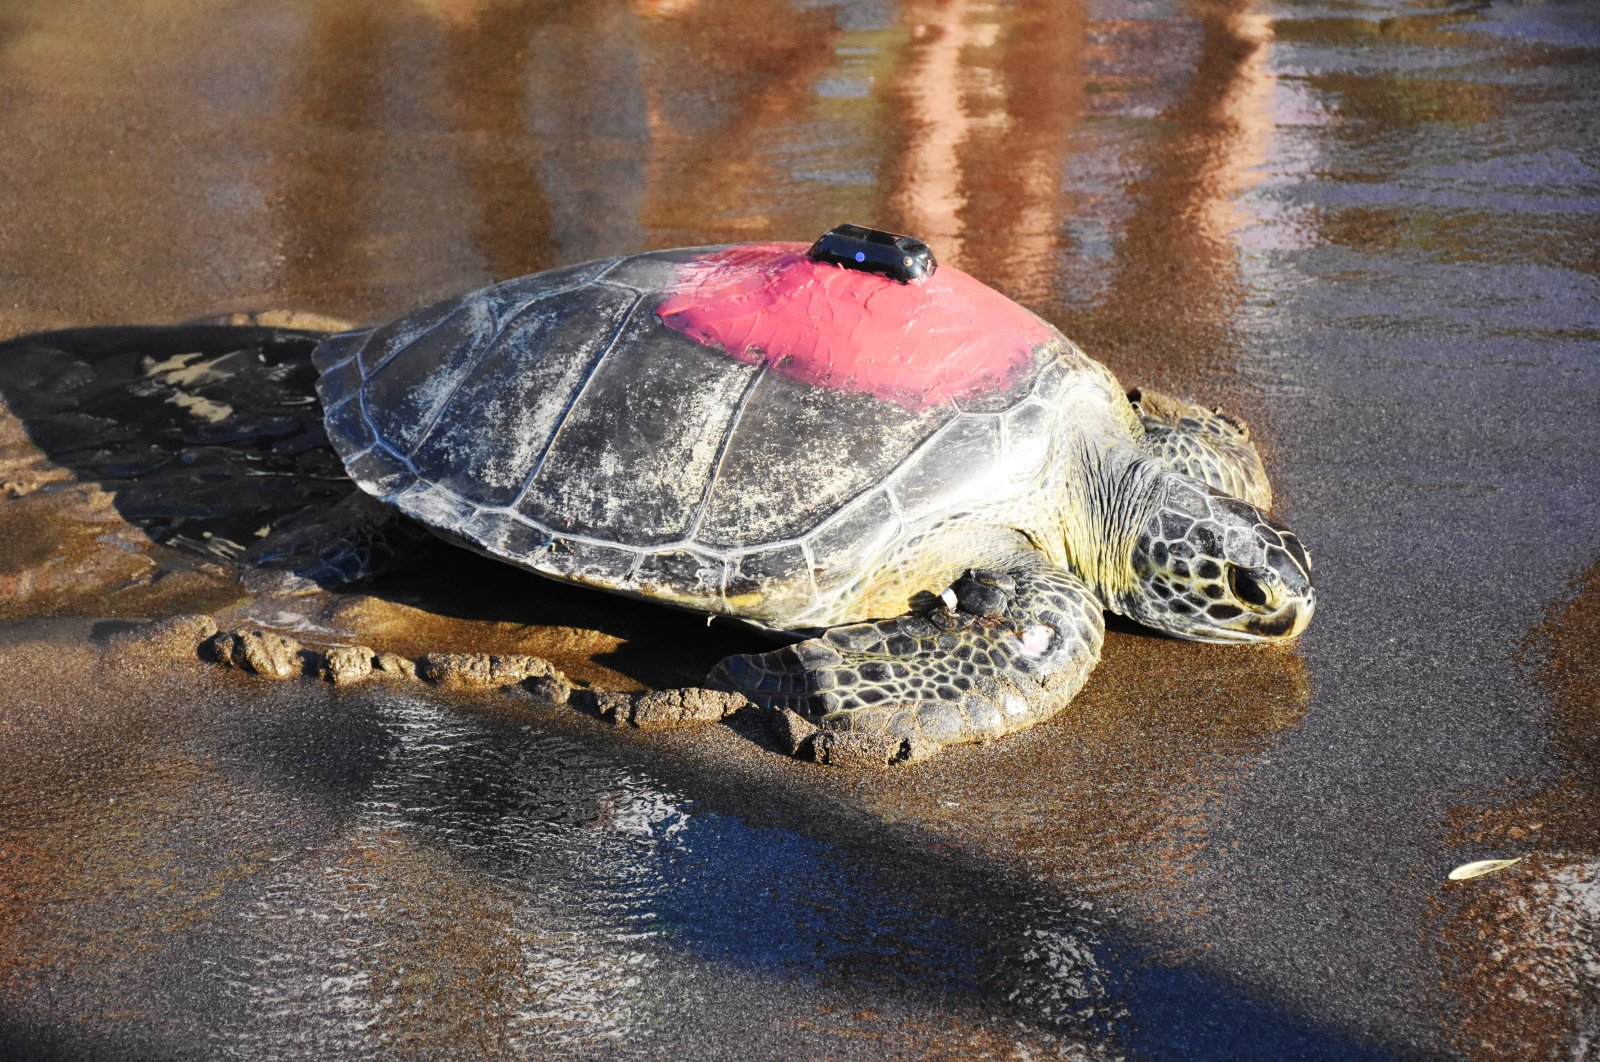 Talay, the green sea turtle, is lying on the beach in Muğla, southwestern Turkey, June 20, 2021. (AA Photo)